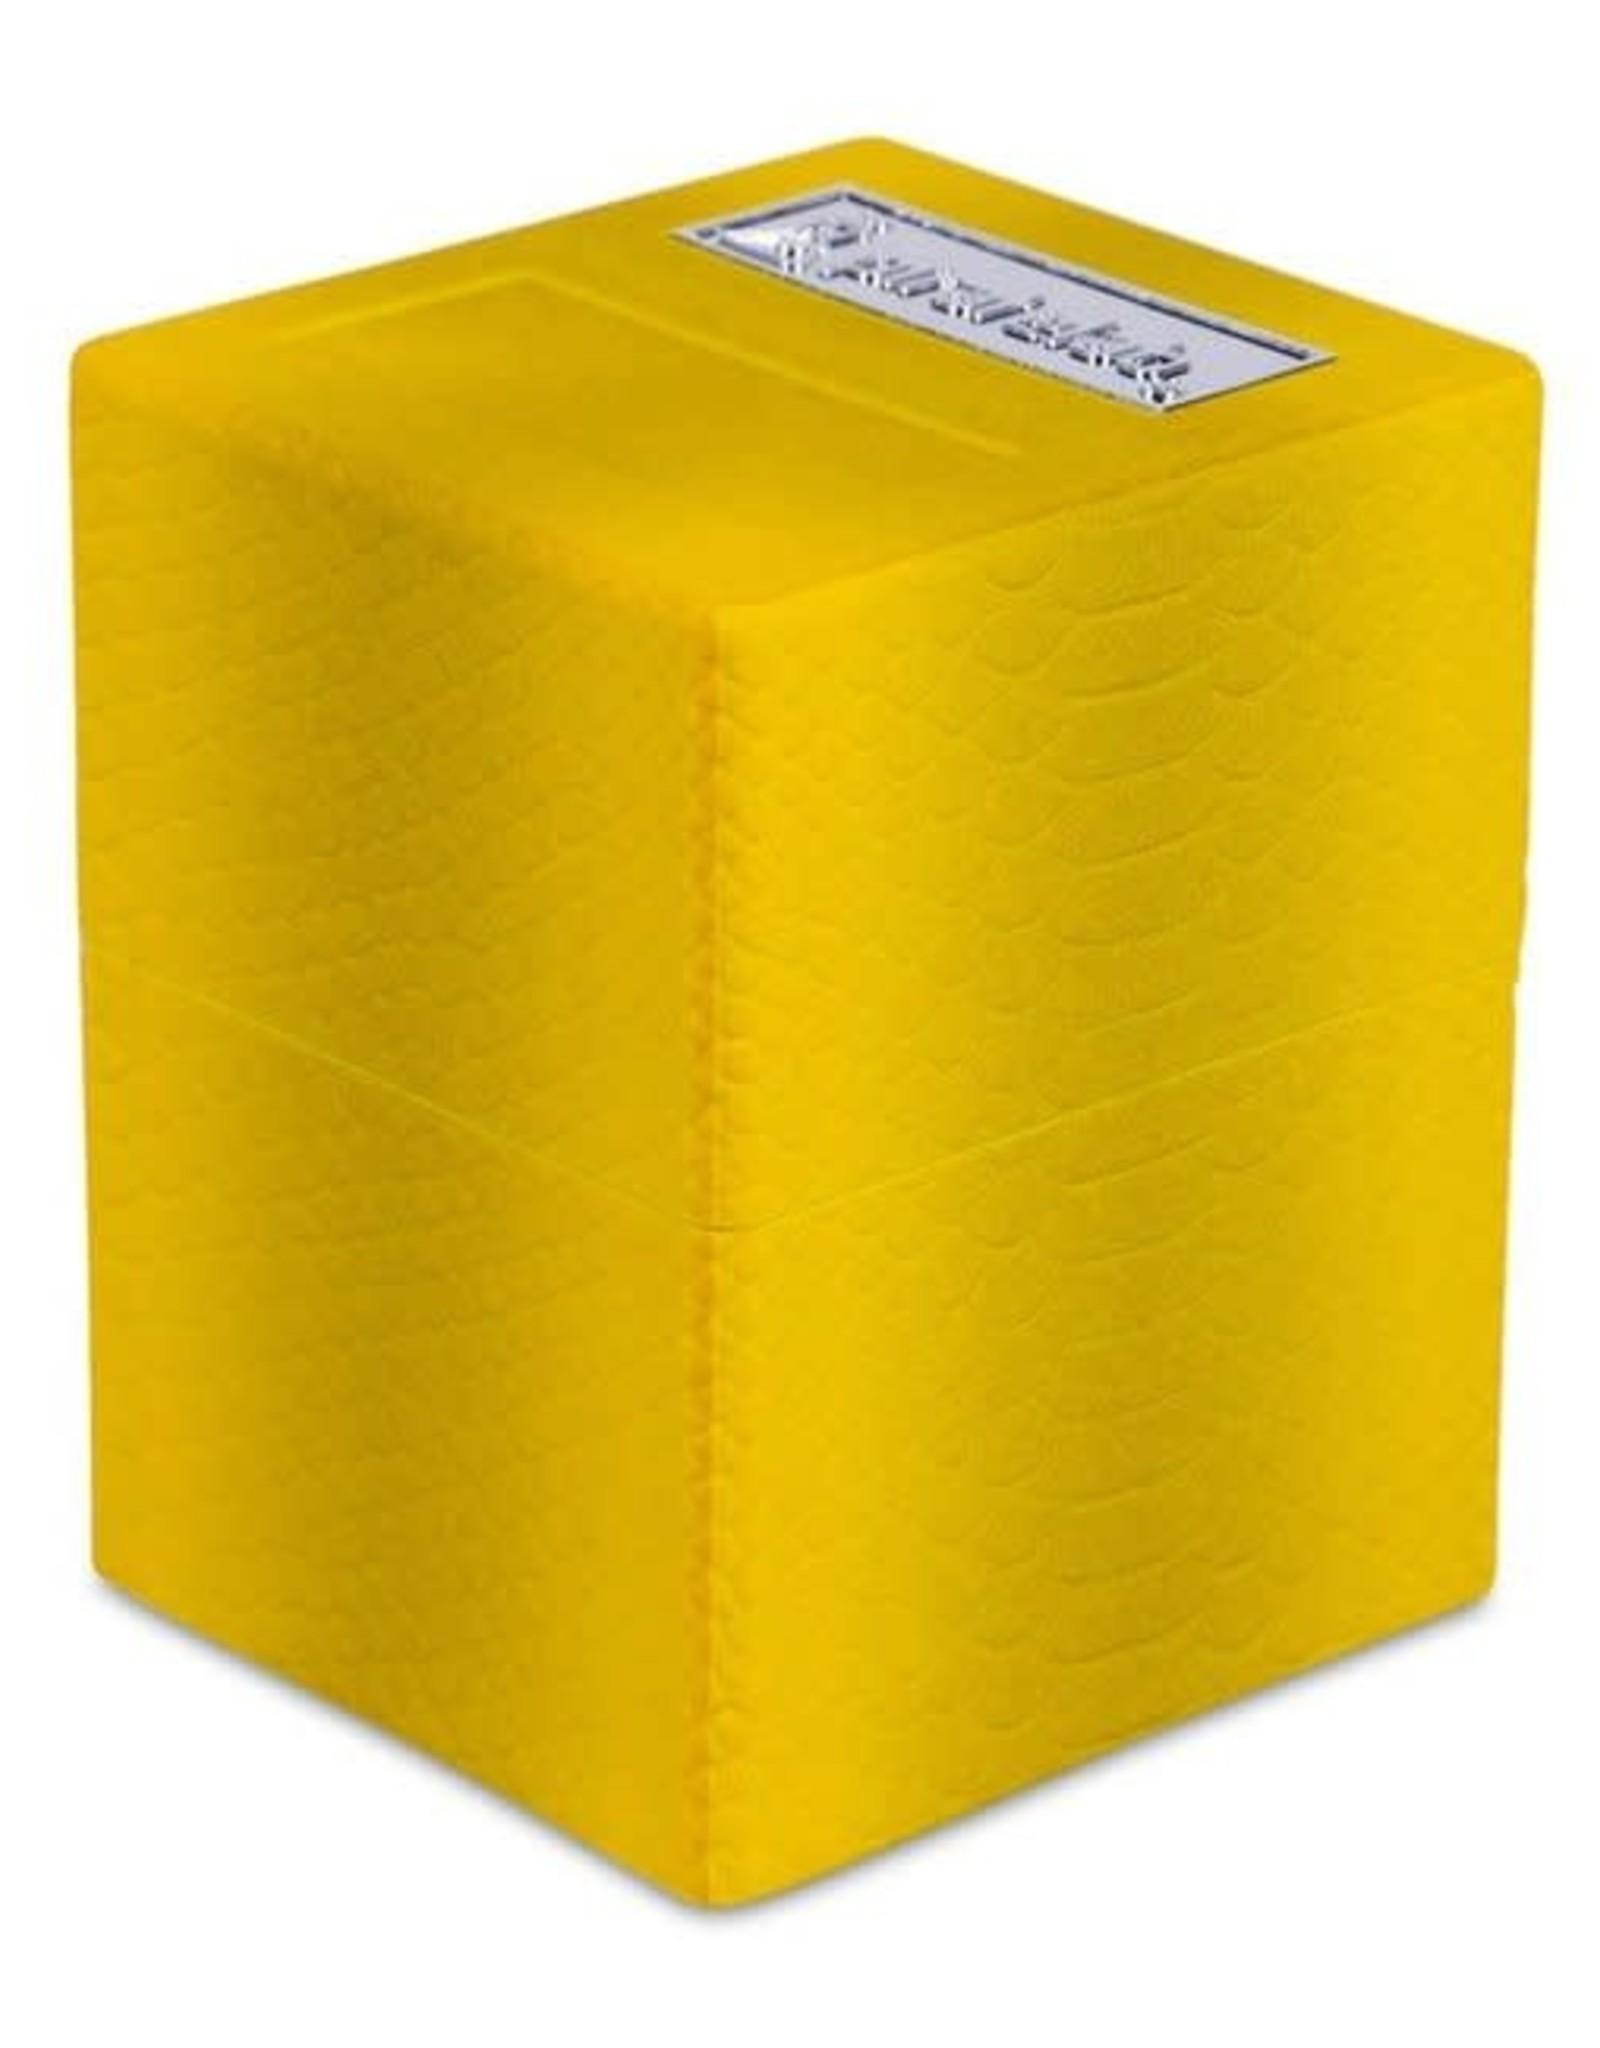 Pirate Lab Defender Deck Box, Texture Series, Dragon, Slime Yellow